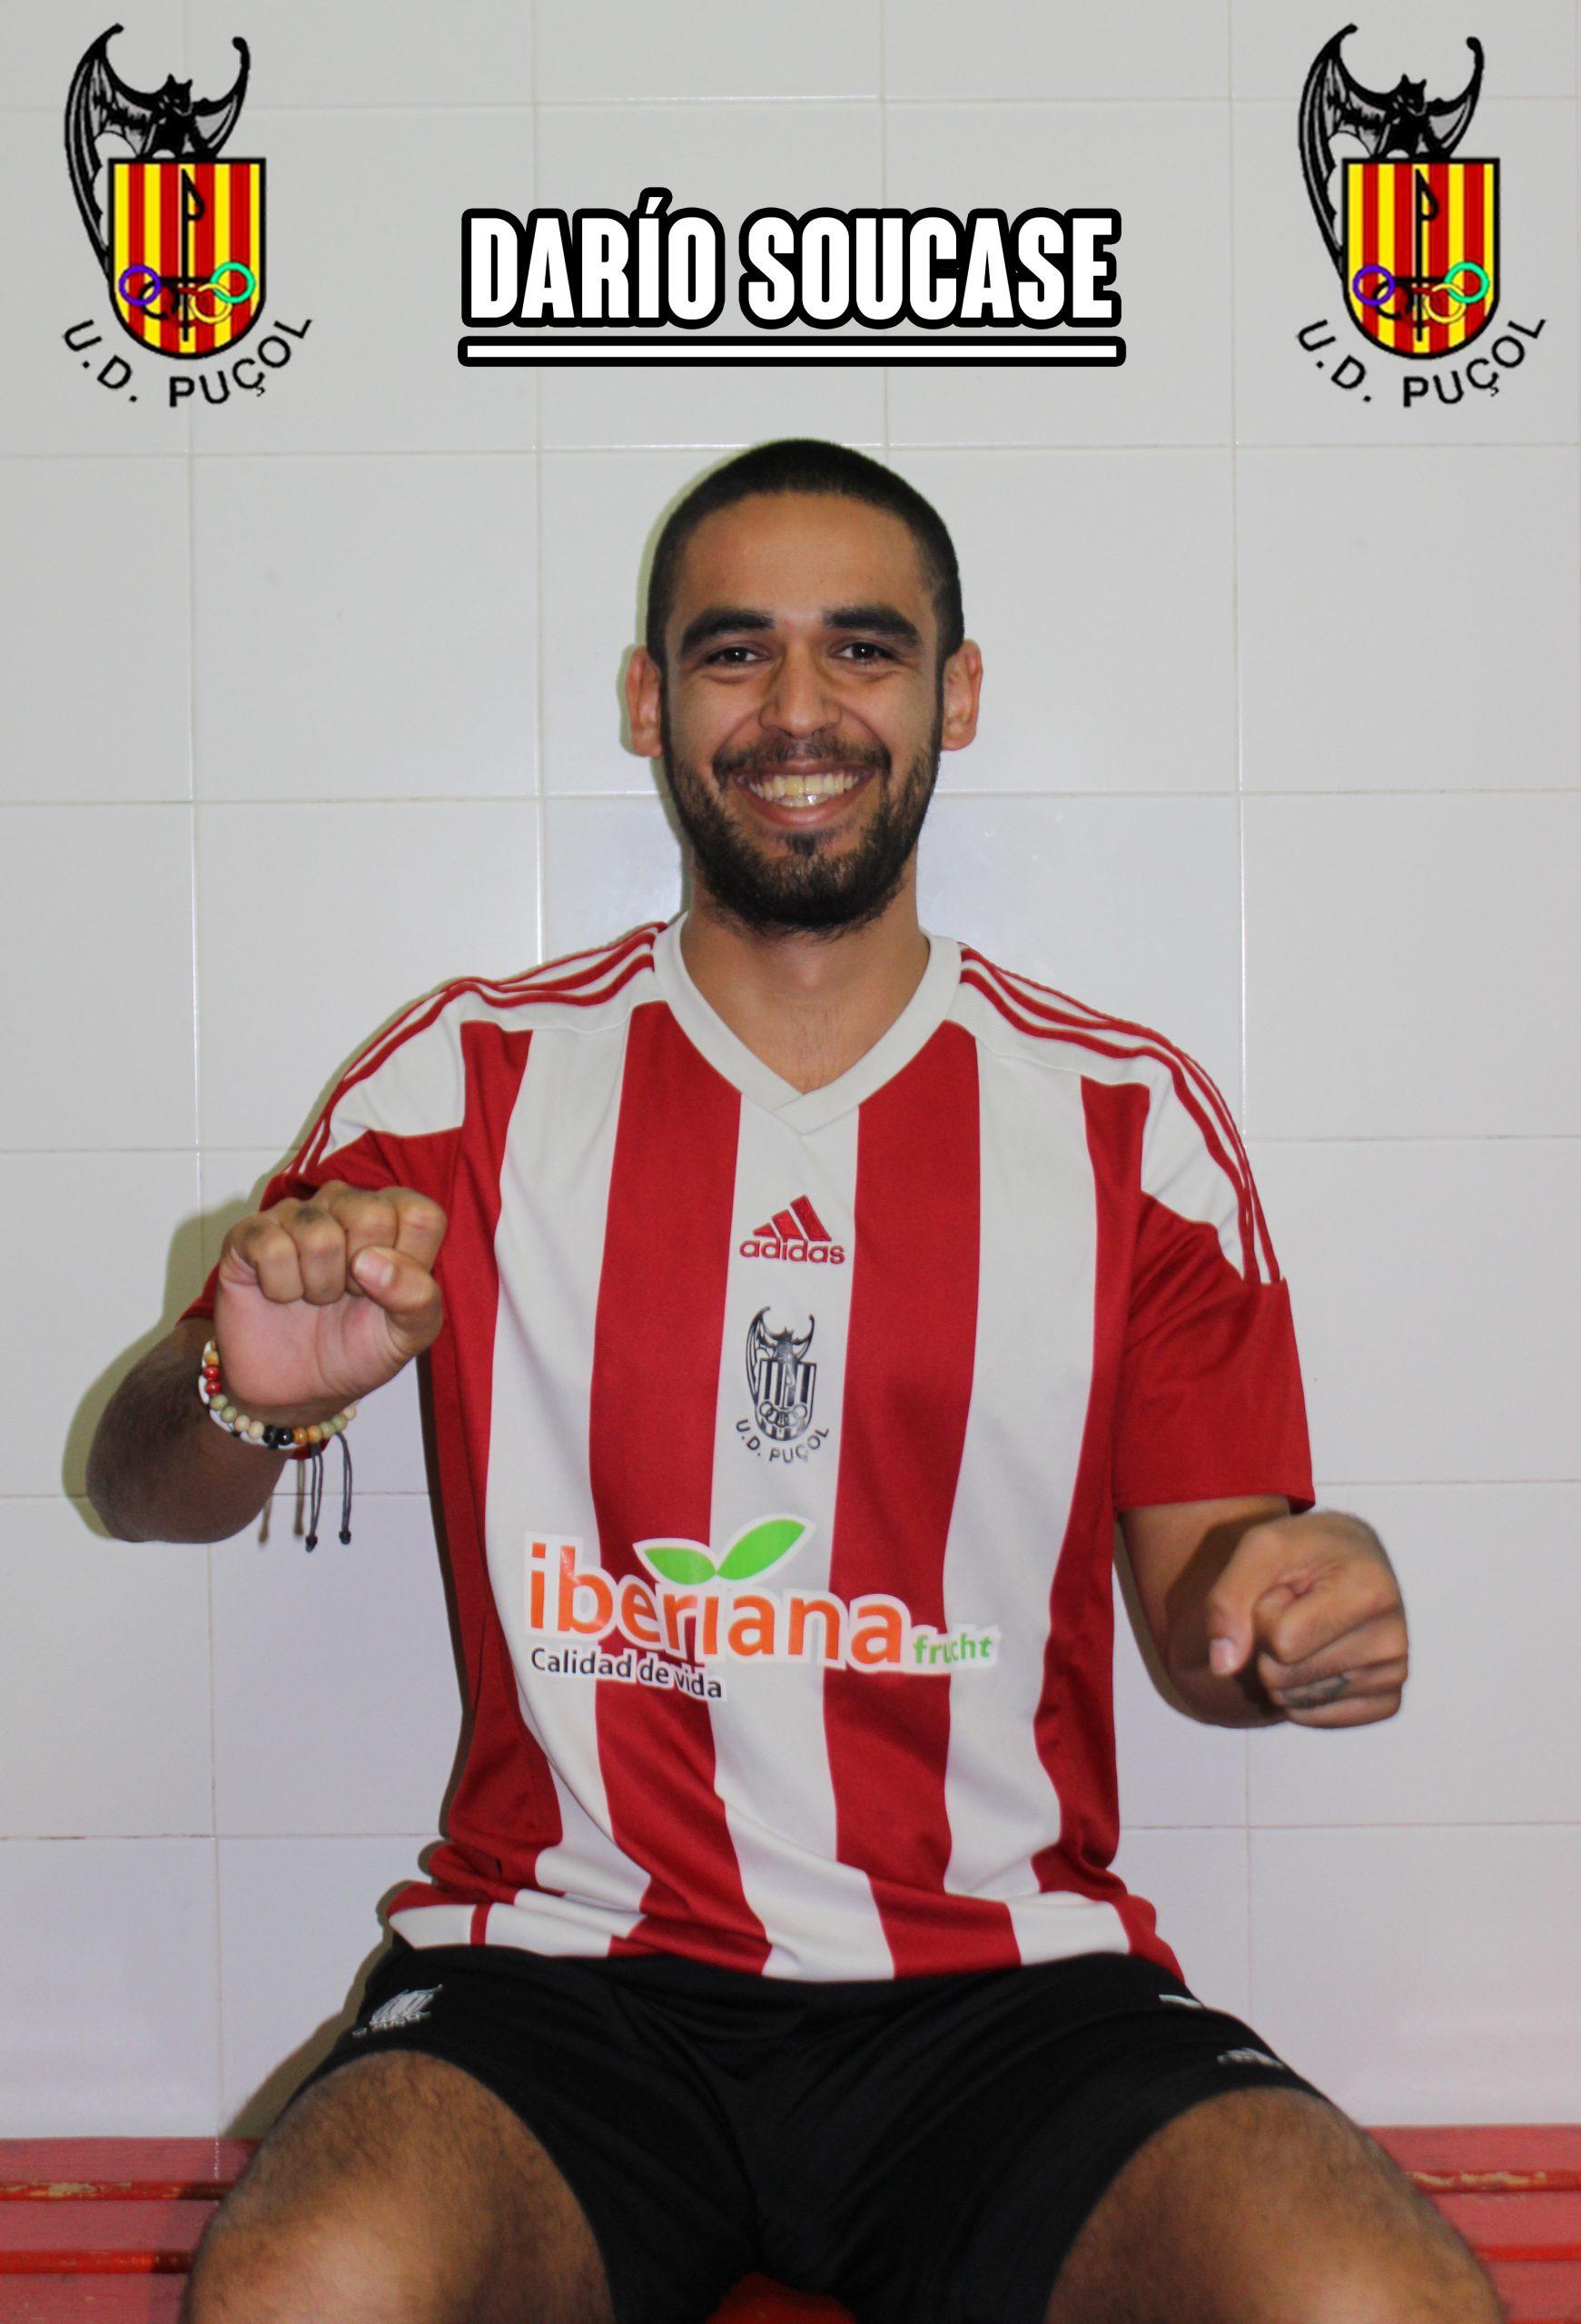 Darío Soucase